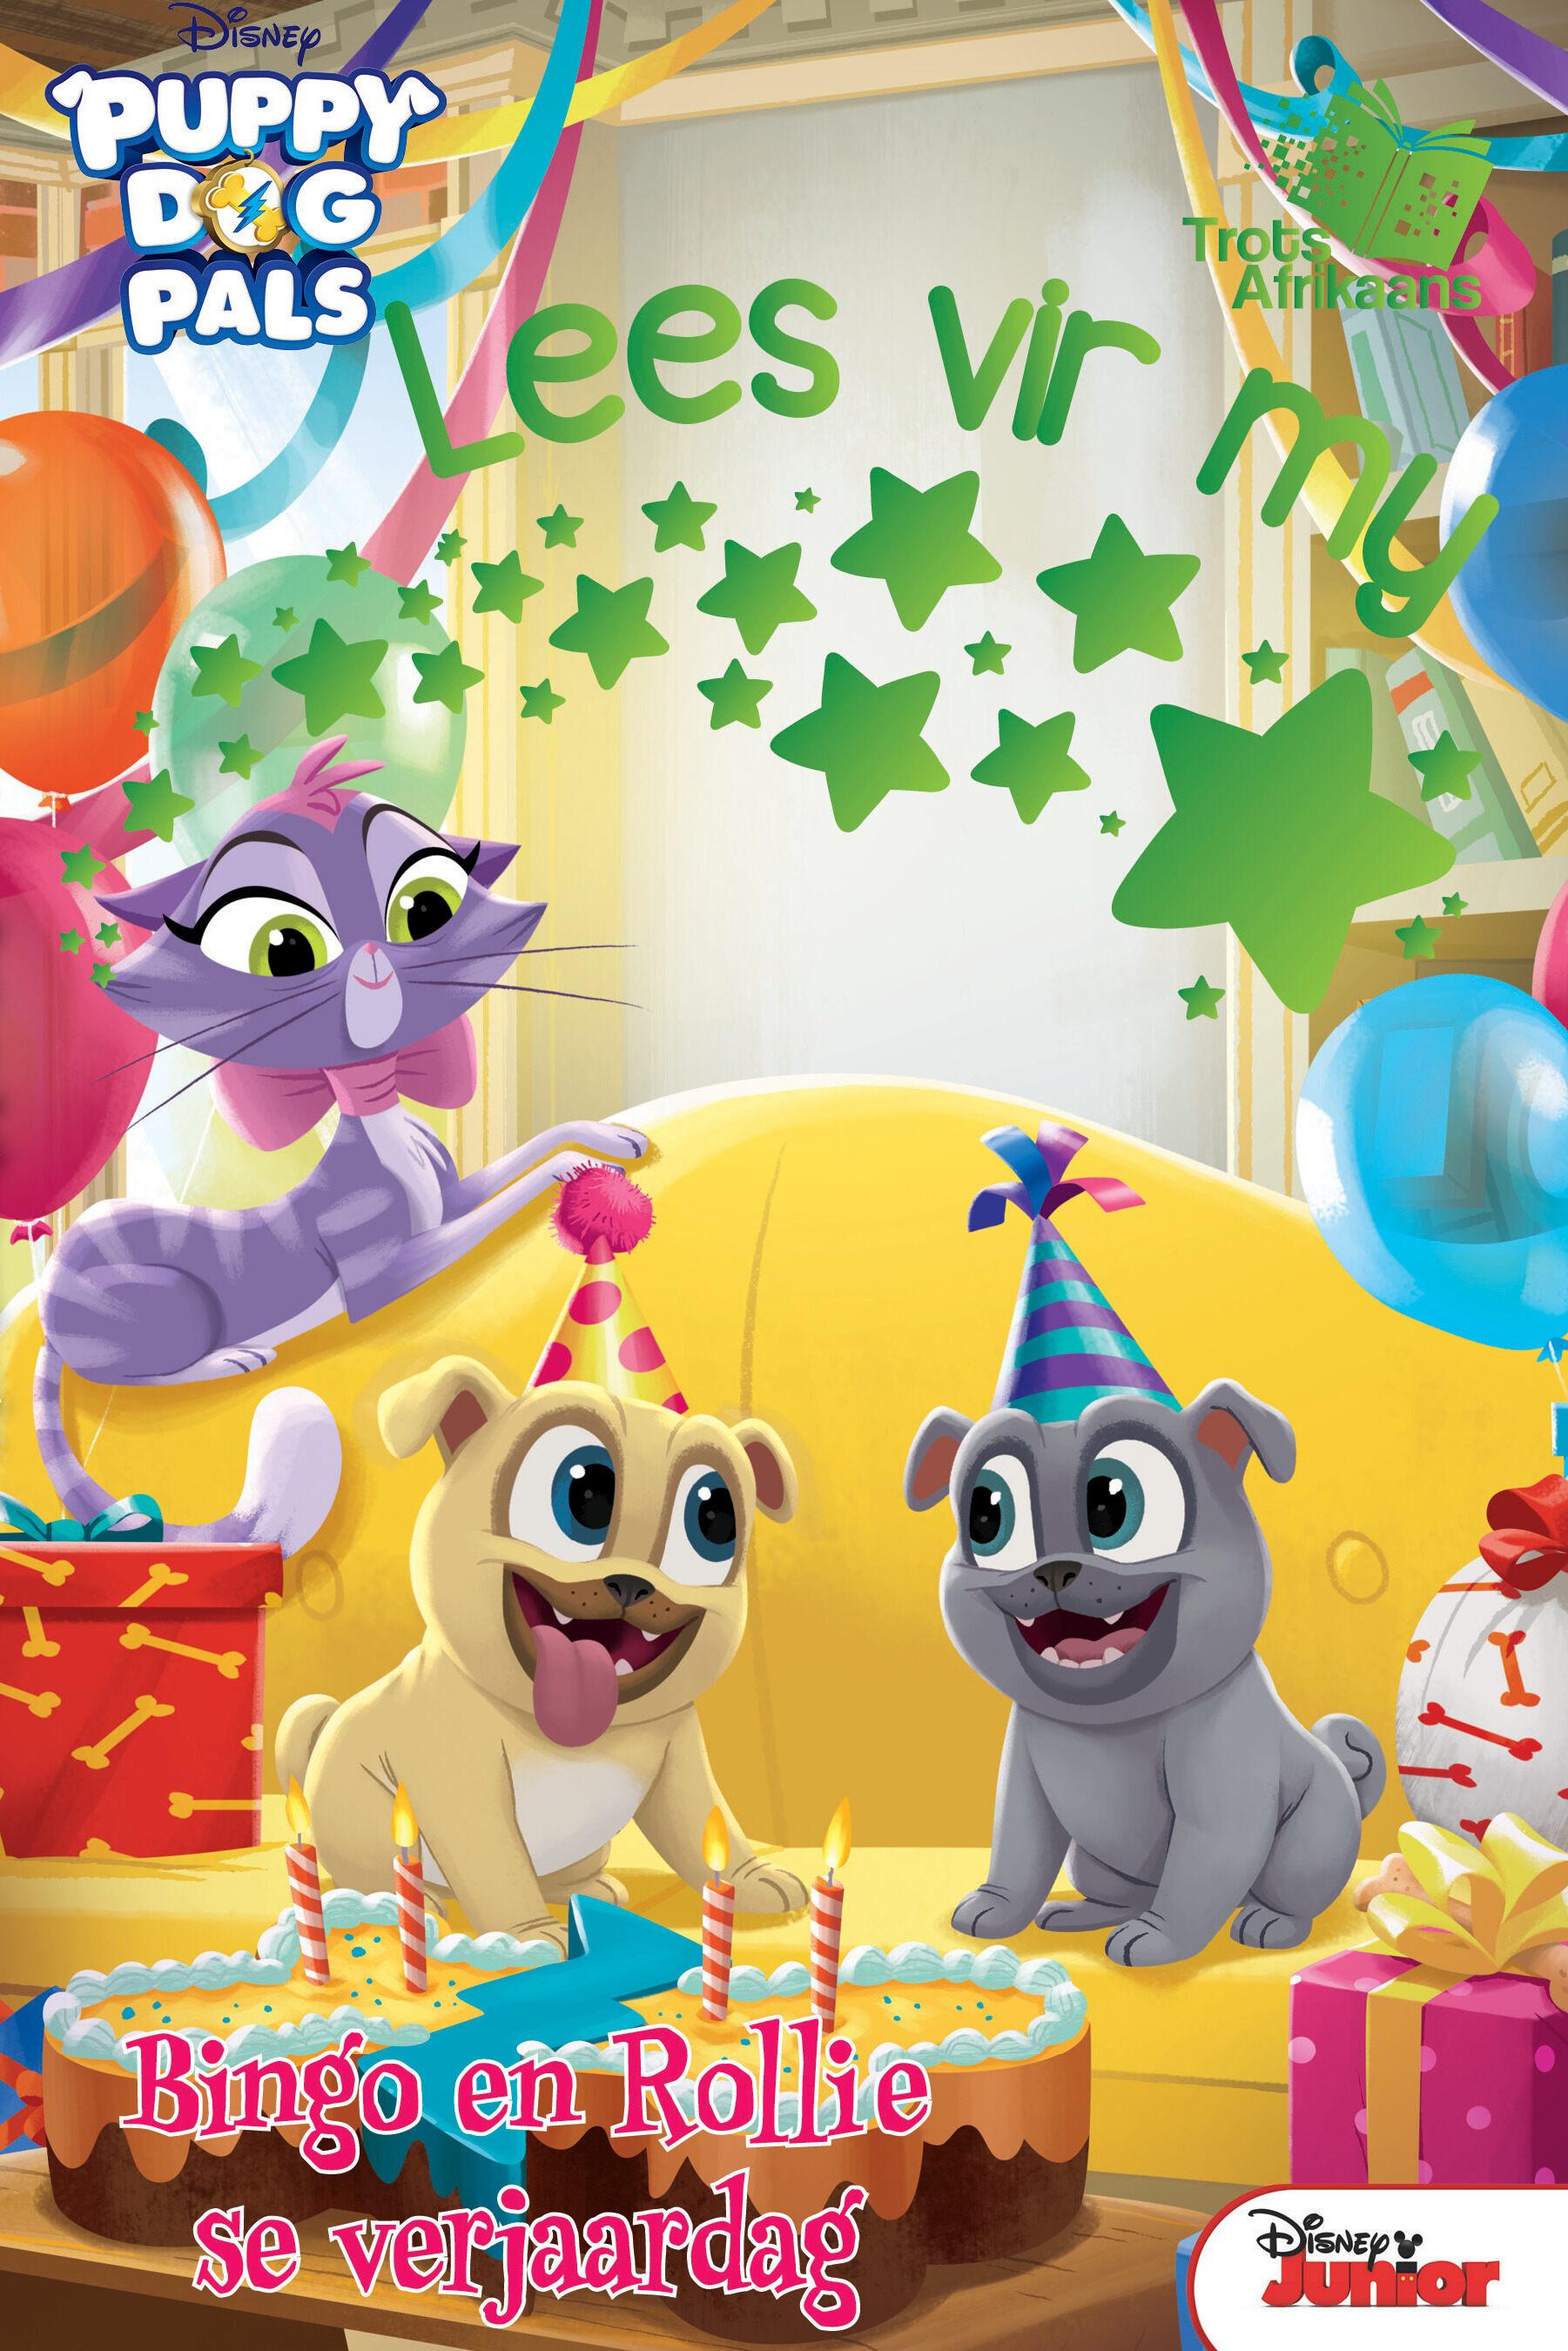 Disney Puppy Dog Pals - Lees Vir My